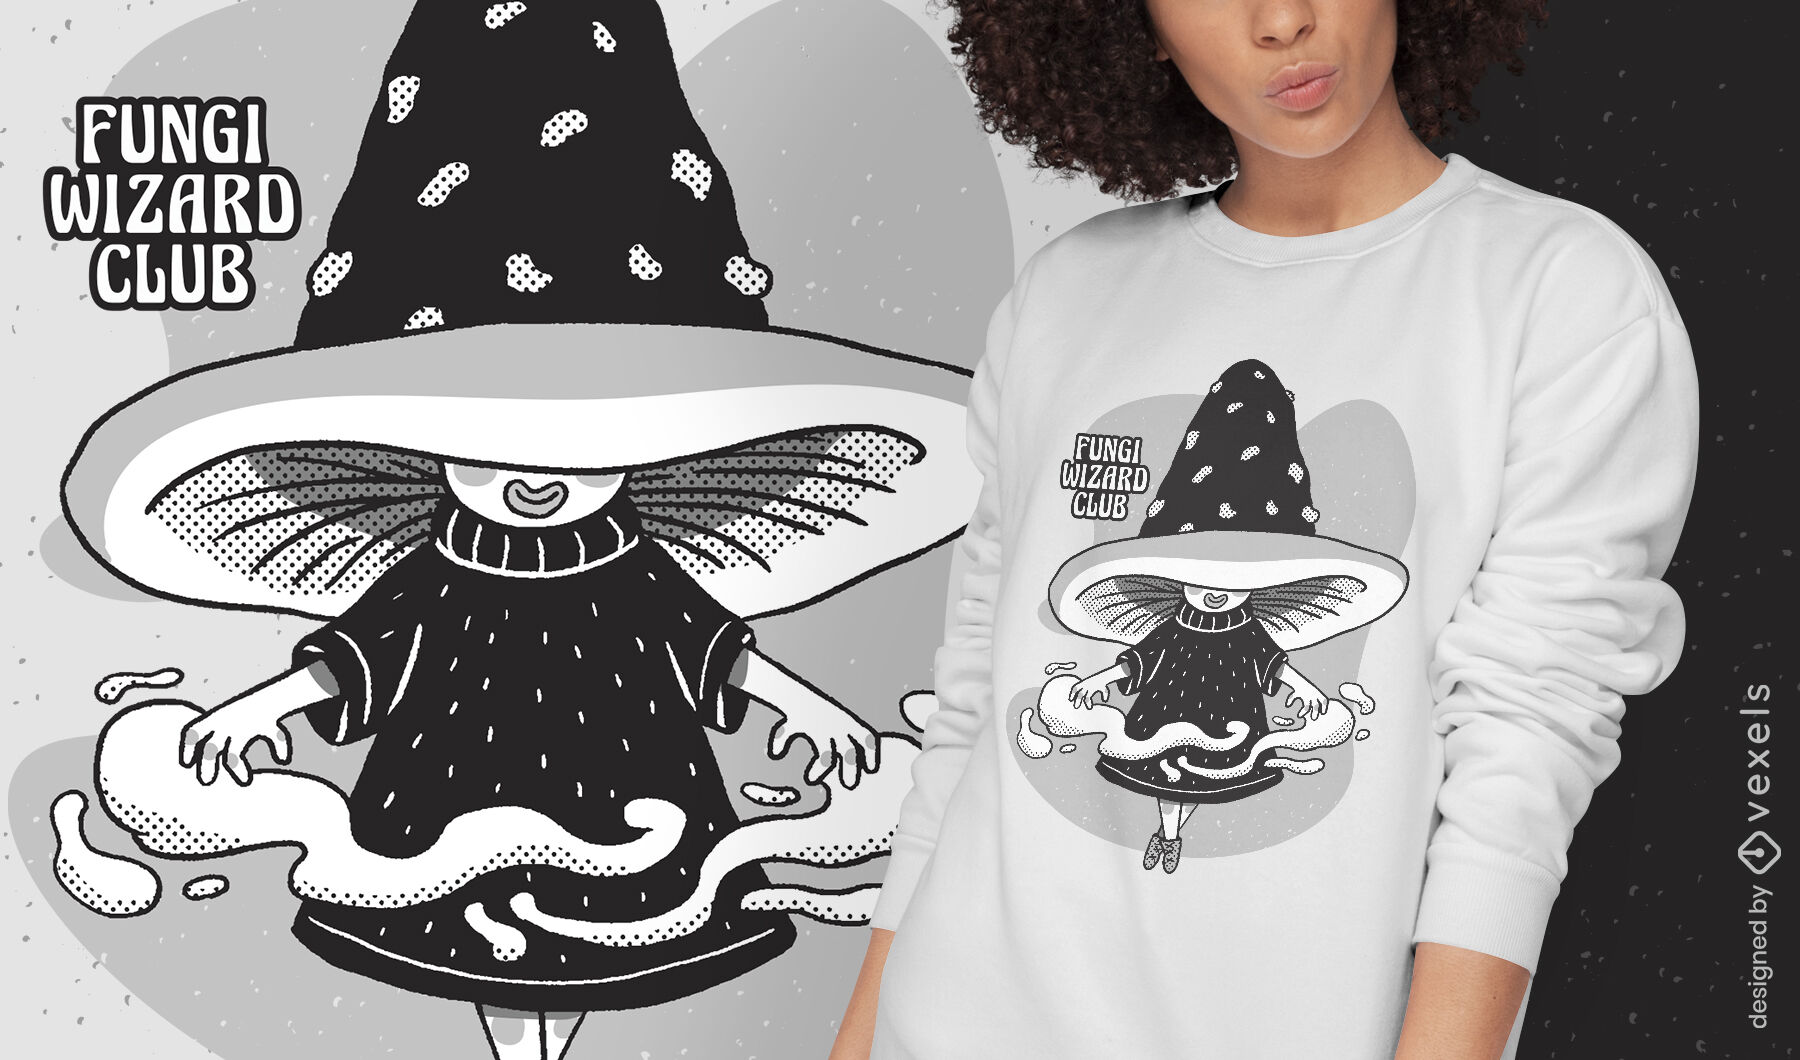 Fungi cartoon wizard fantasy t-shirt design